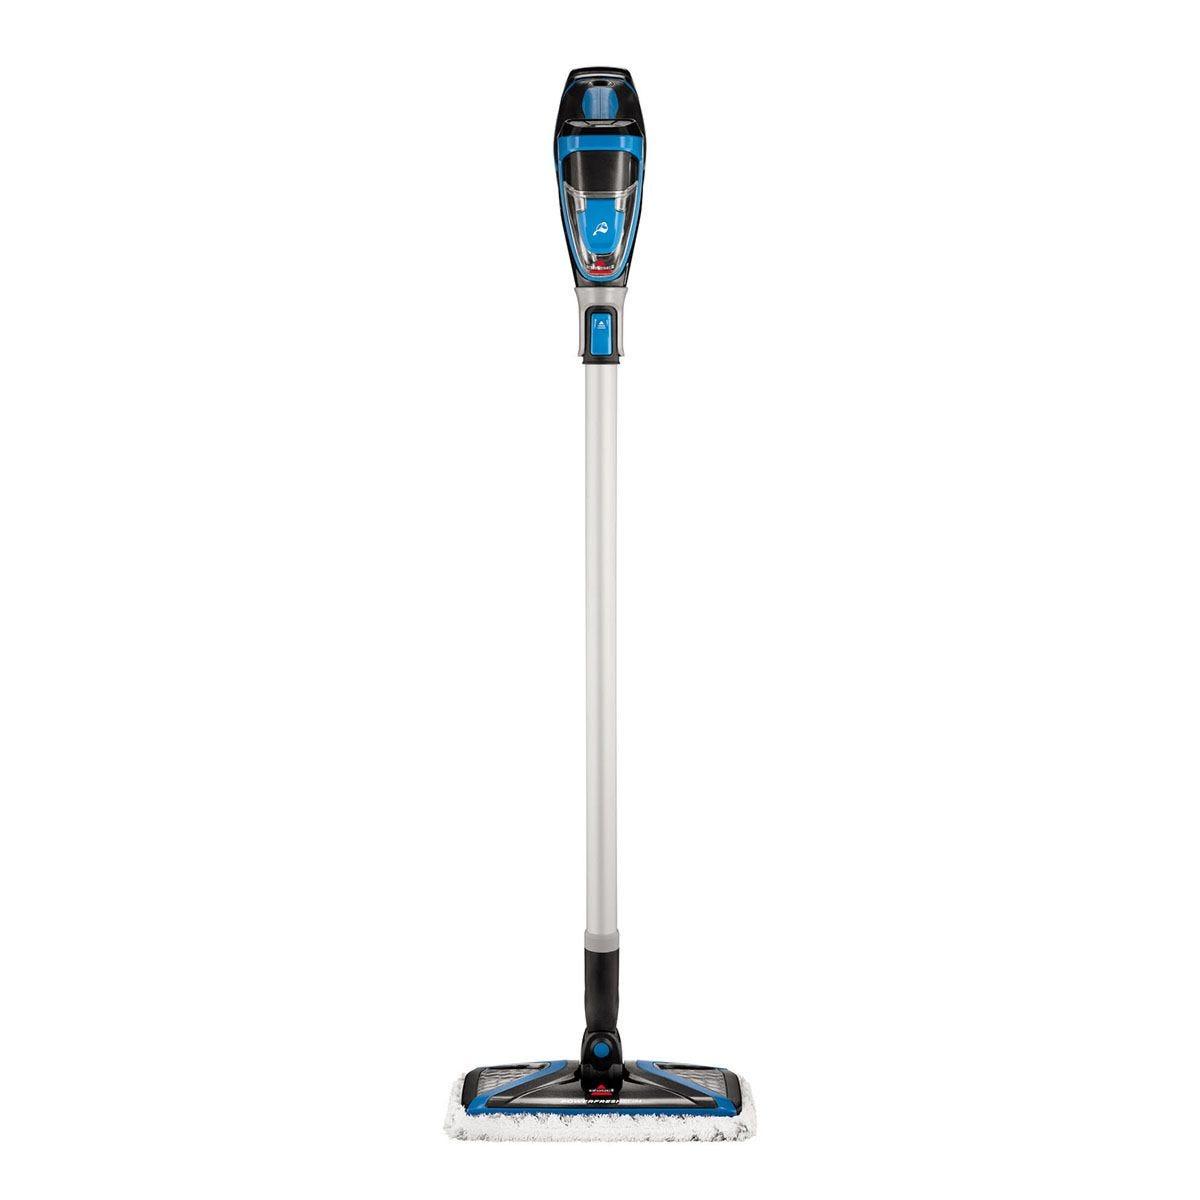 BISSELL 2234E Powerfresh Slim Steam Cleaner - Titanium/Bossanova Blue